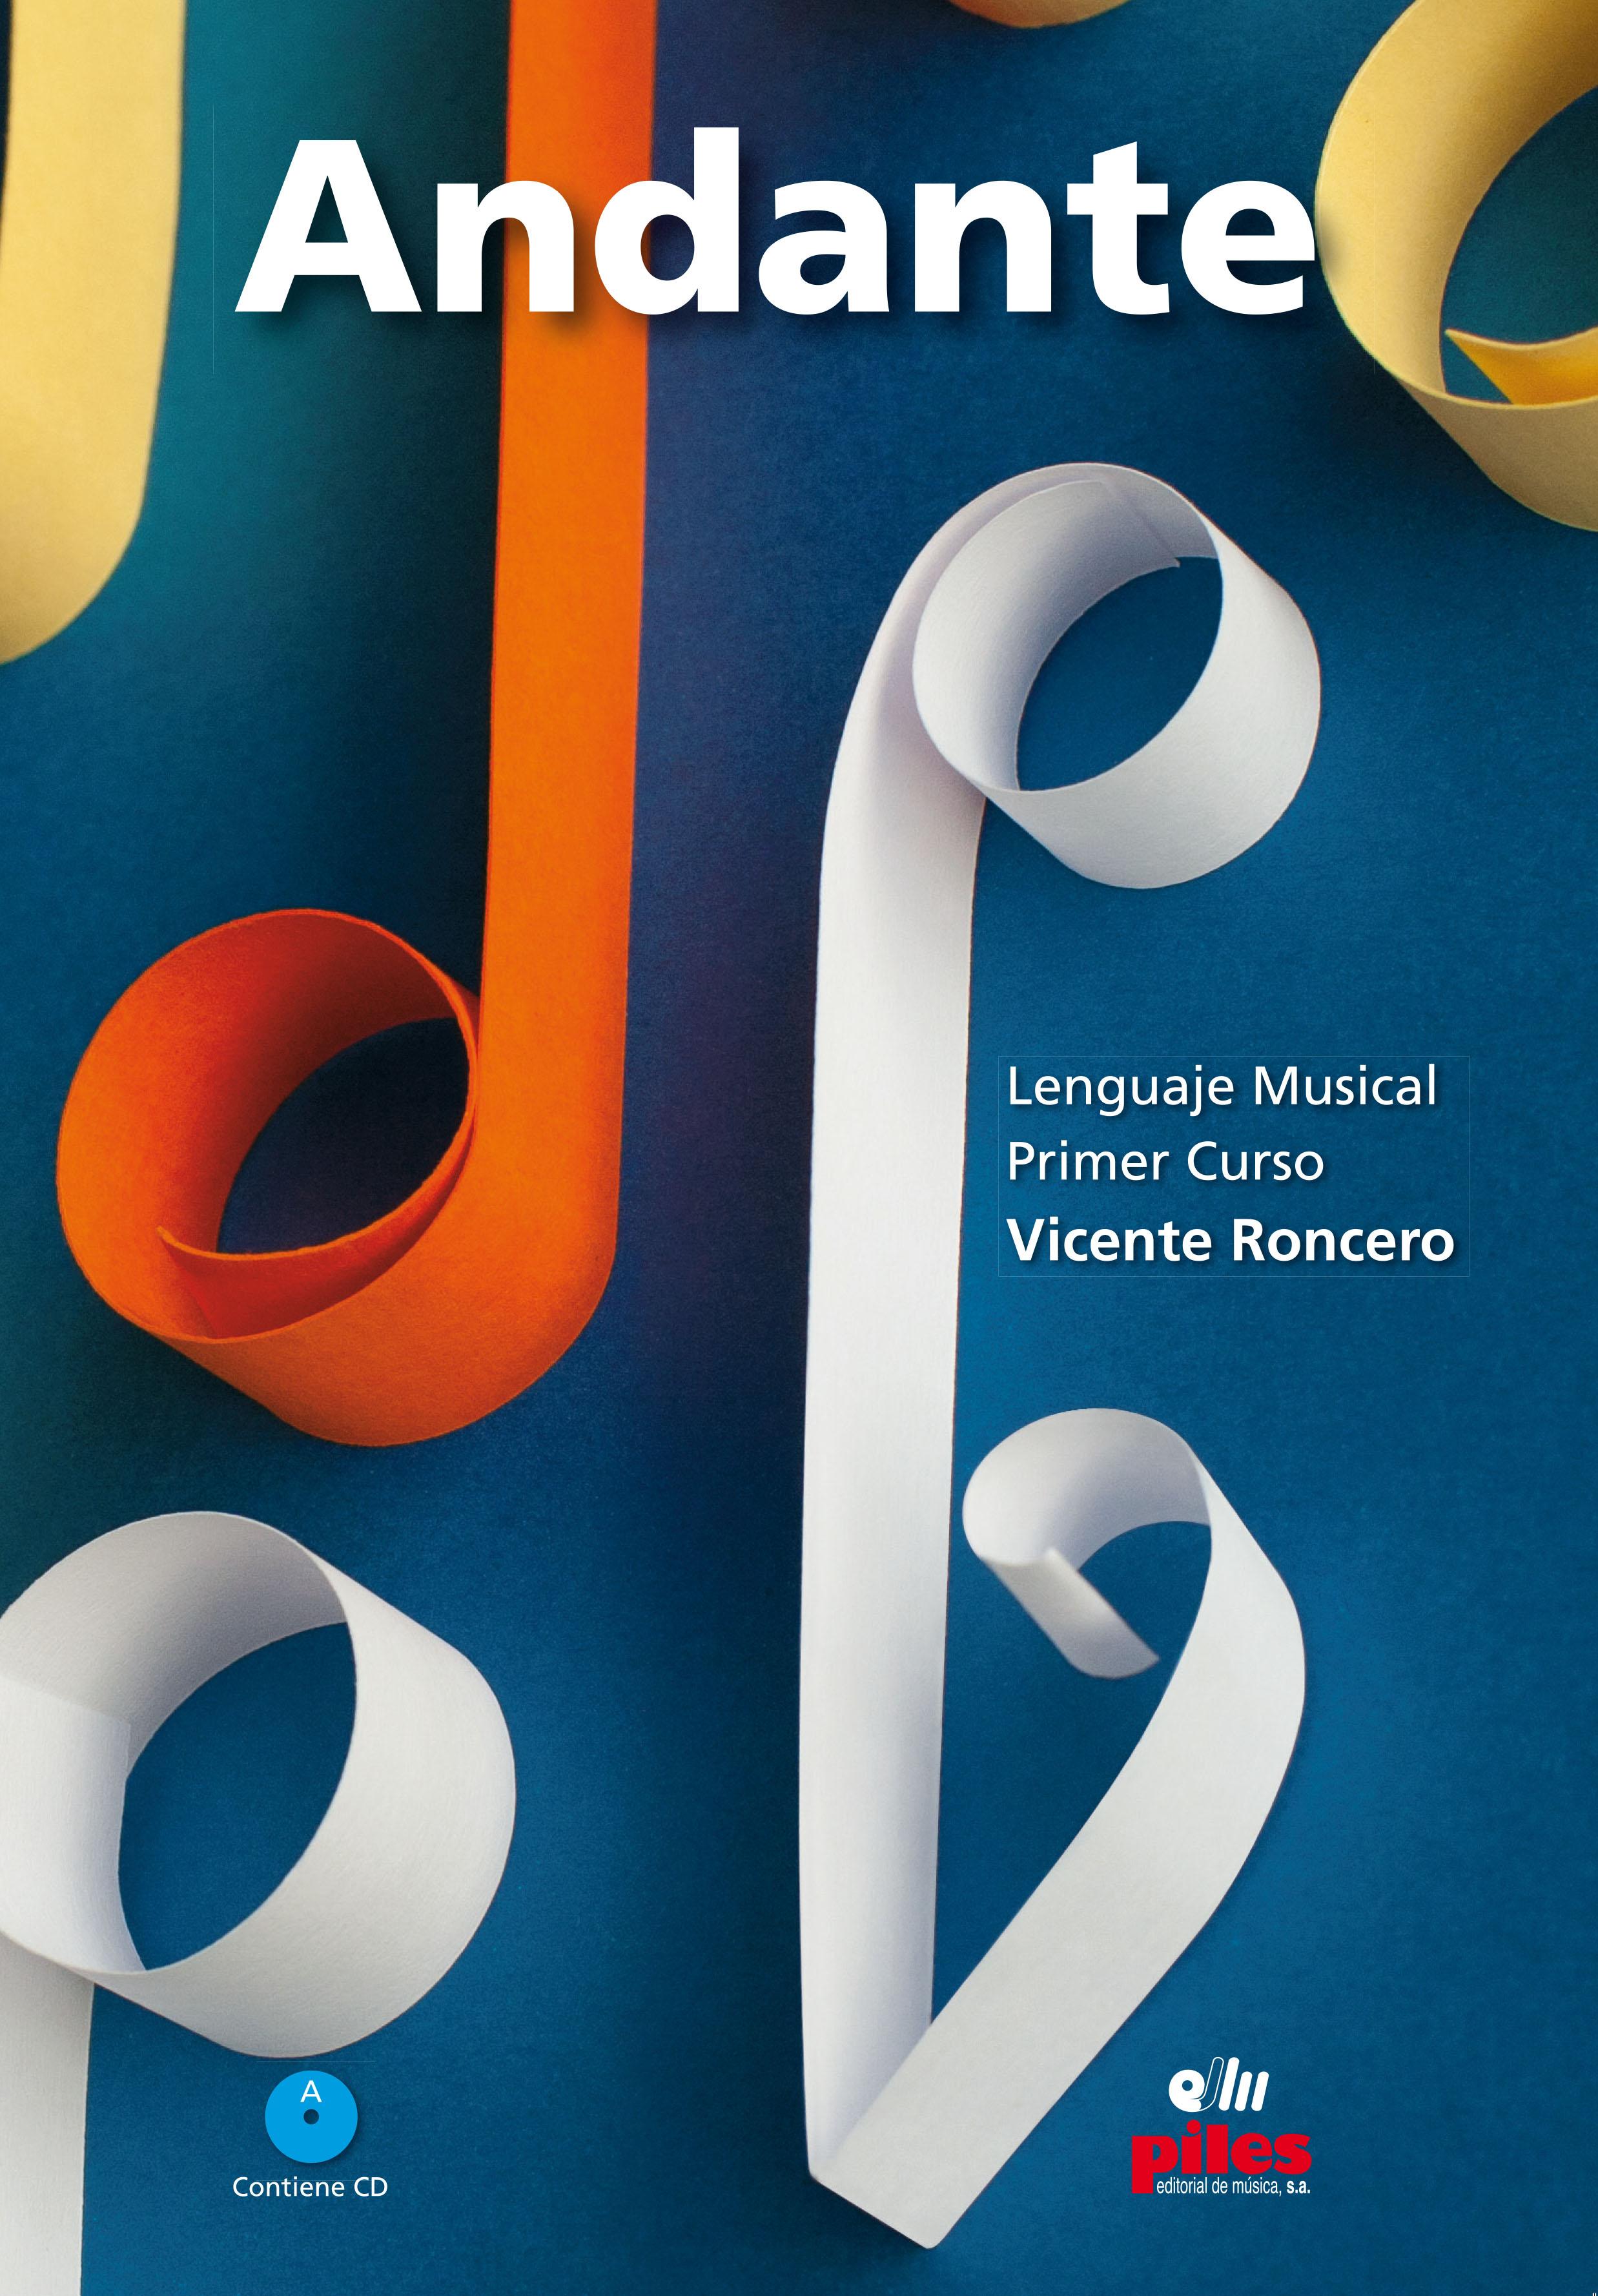 http://pilesmusic.net/tienda/vocal-y-varios/pedagogia/lenguaje-musical-conservatorios/andante-1-primer-curso-cd-nueva-ed-3/?keyword=ANDANTE+RONCERO